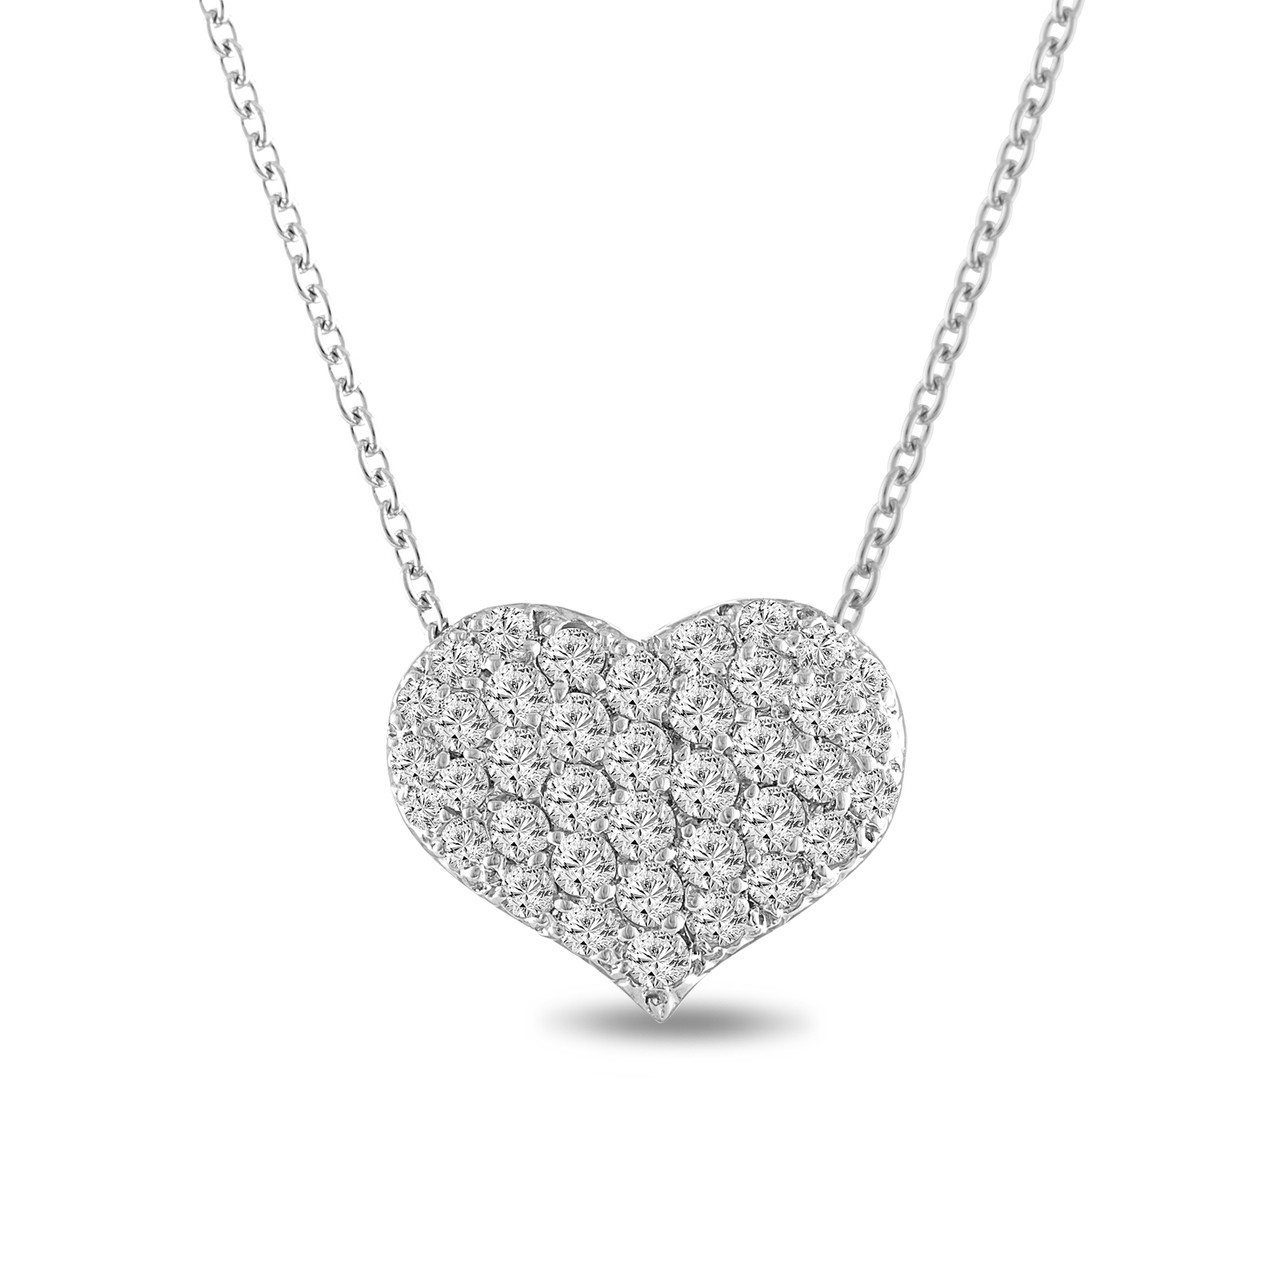 Diamond heart pendant necklace 100 carat 14k white gold pave set diamond heart pendant necklace 100 carat 14k white gold pave set handmade certified aloadofball Choice Image